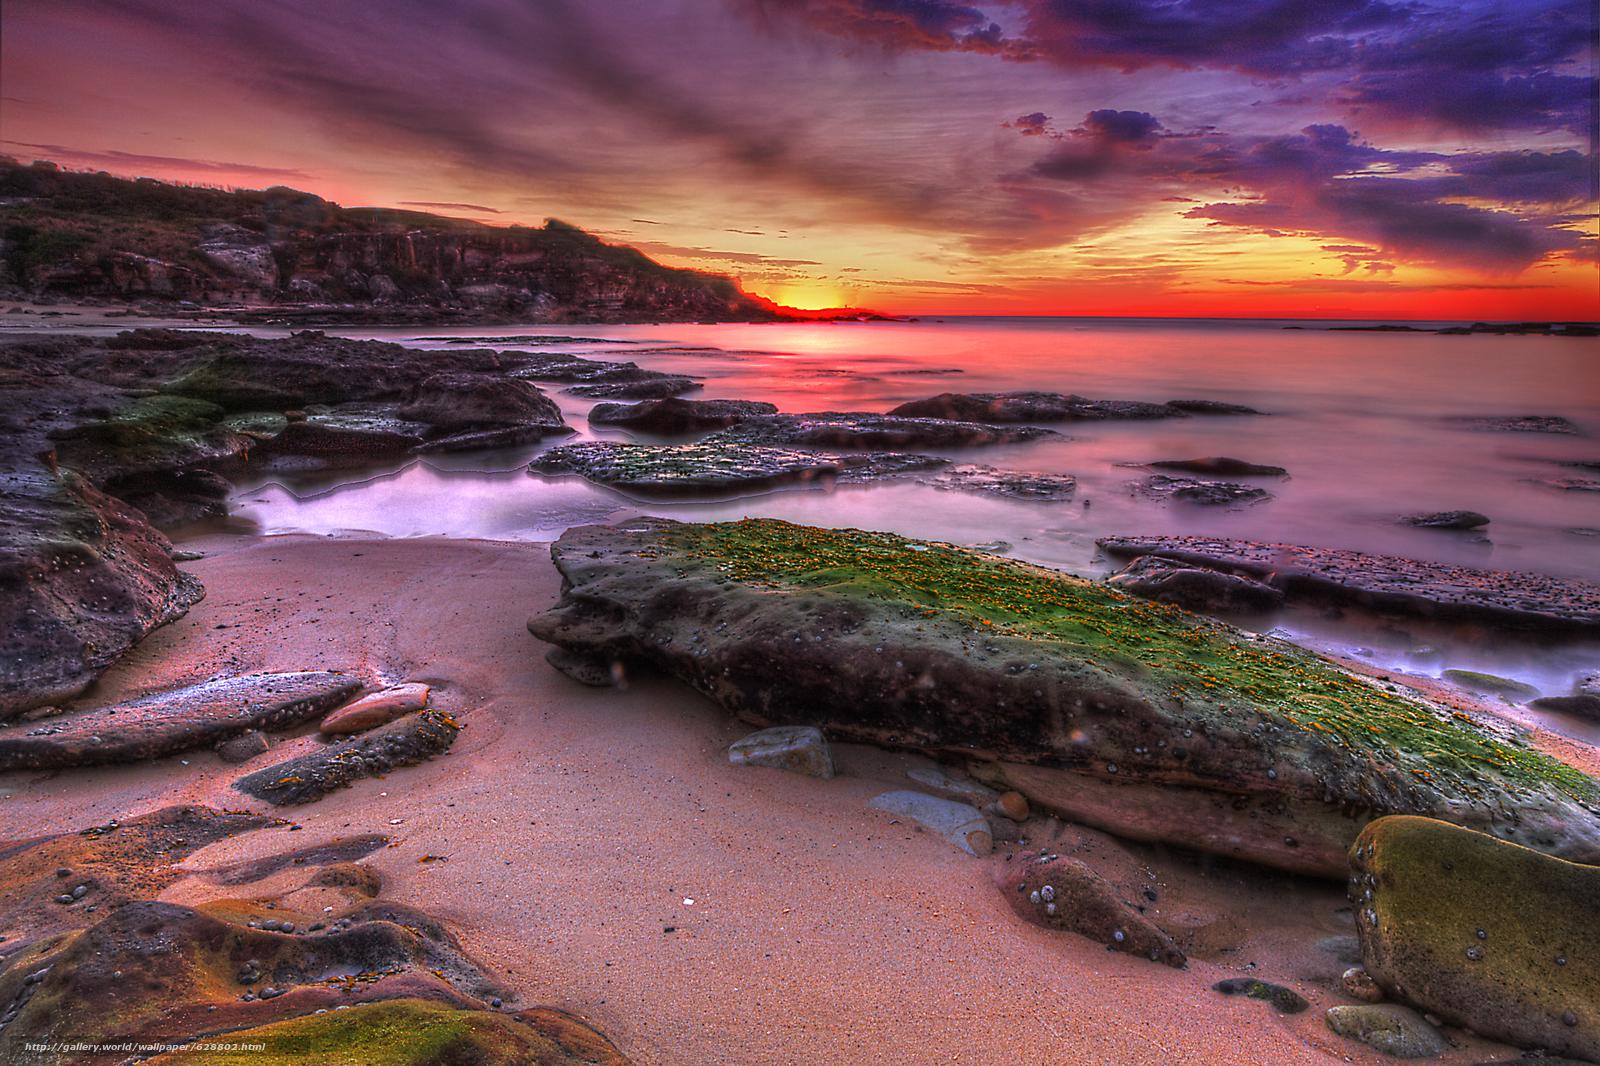 закат, море, скалы, берег, пейзаж